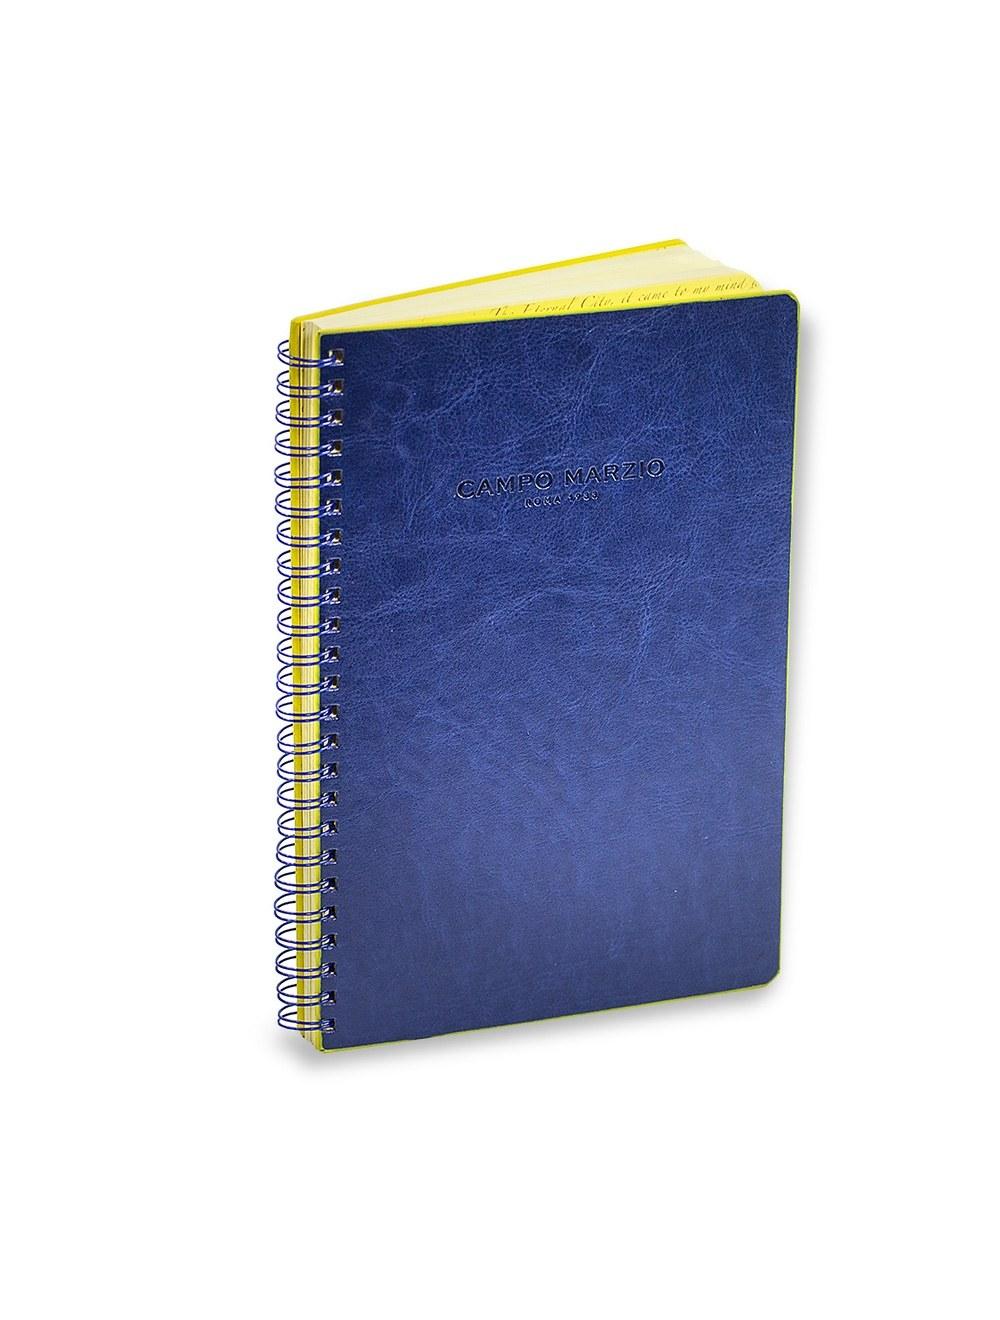 Spiral Bound Notes A4 - Ocean Blue